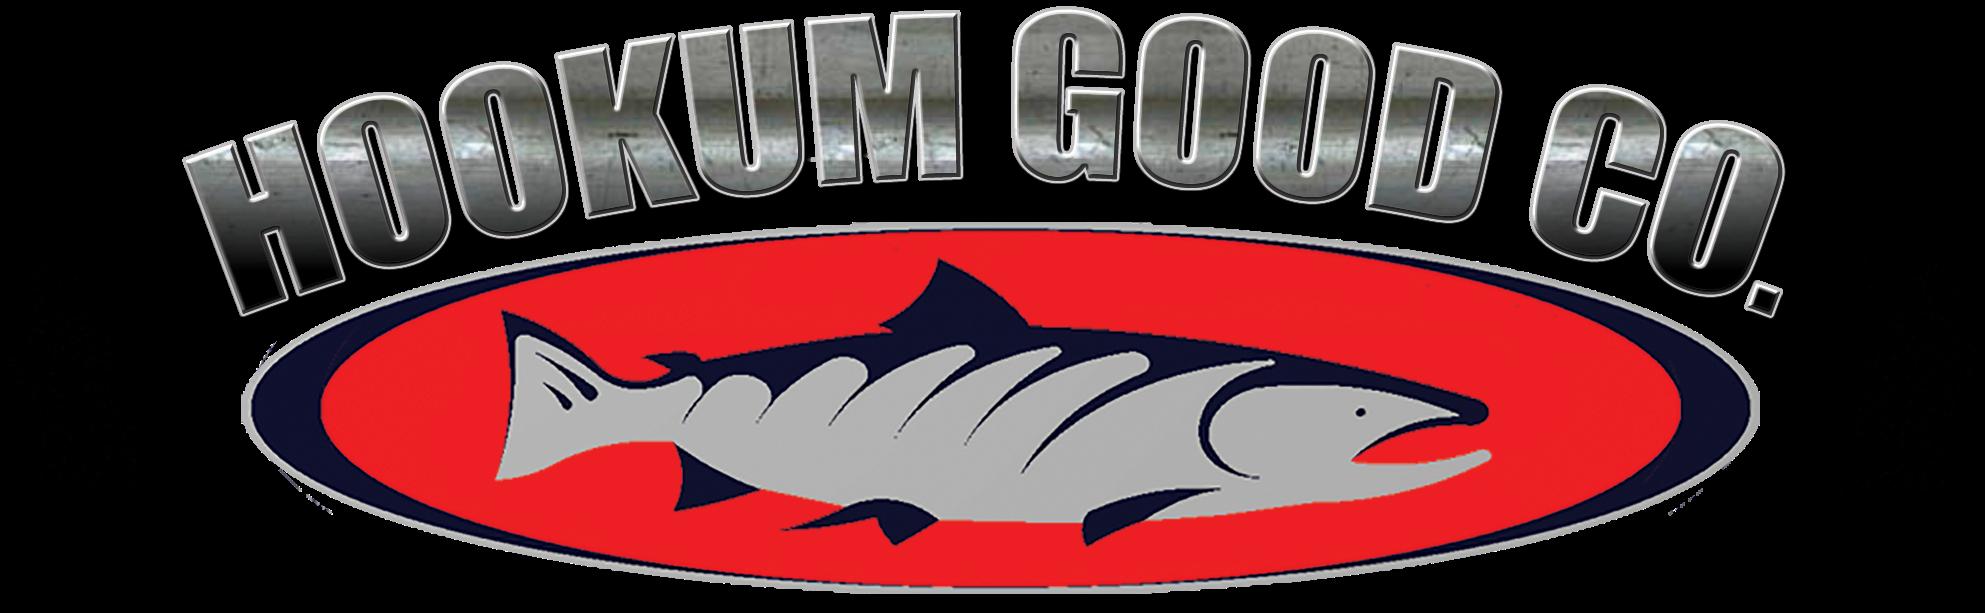 Hookum Good